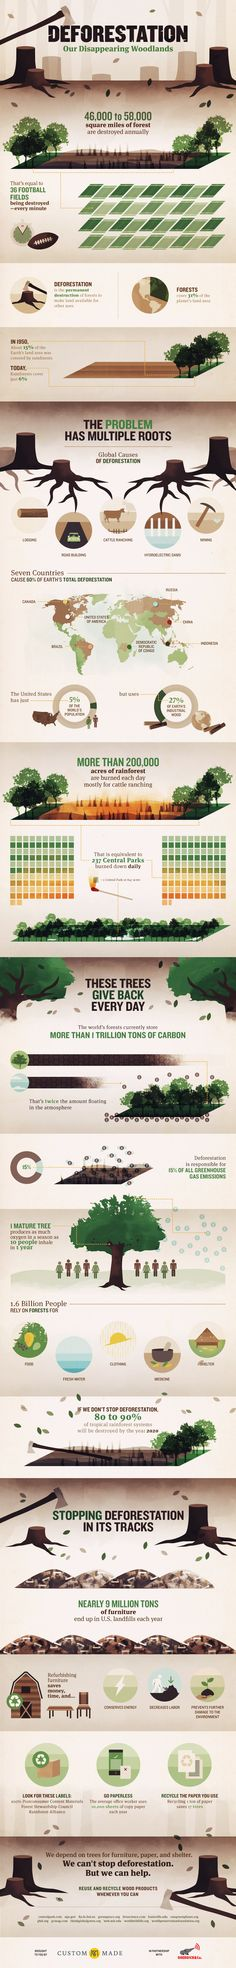 Deforestation [Infographic]